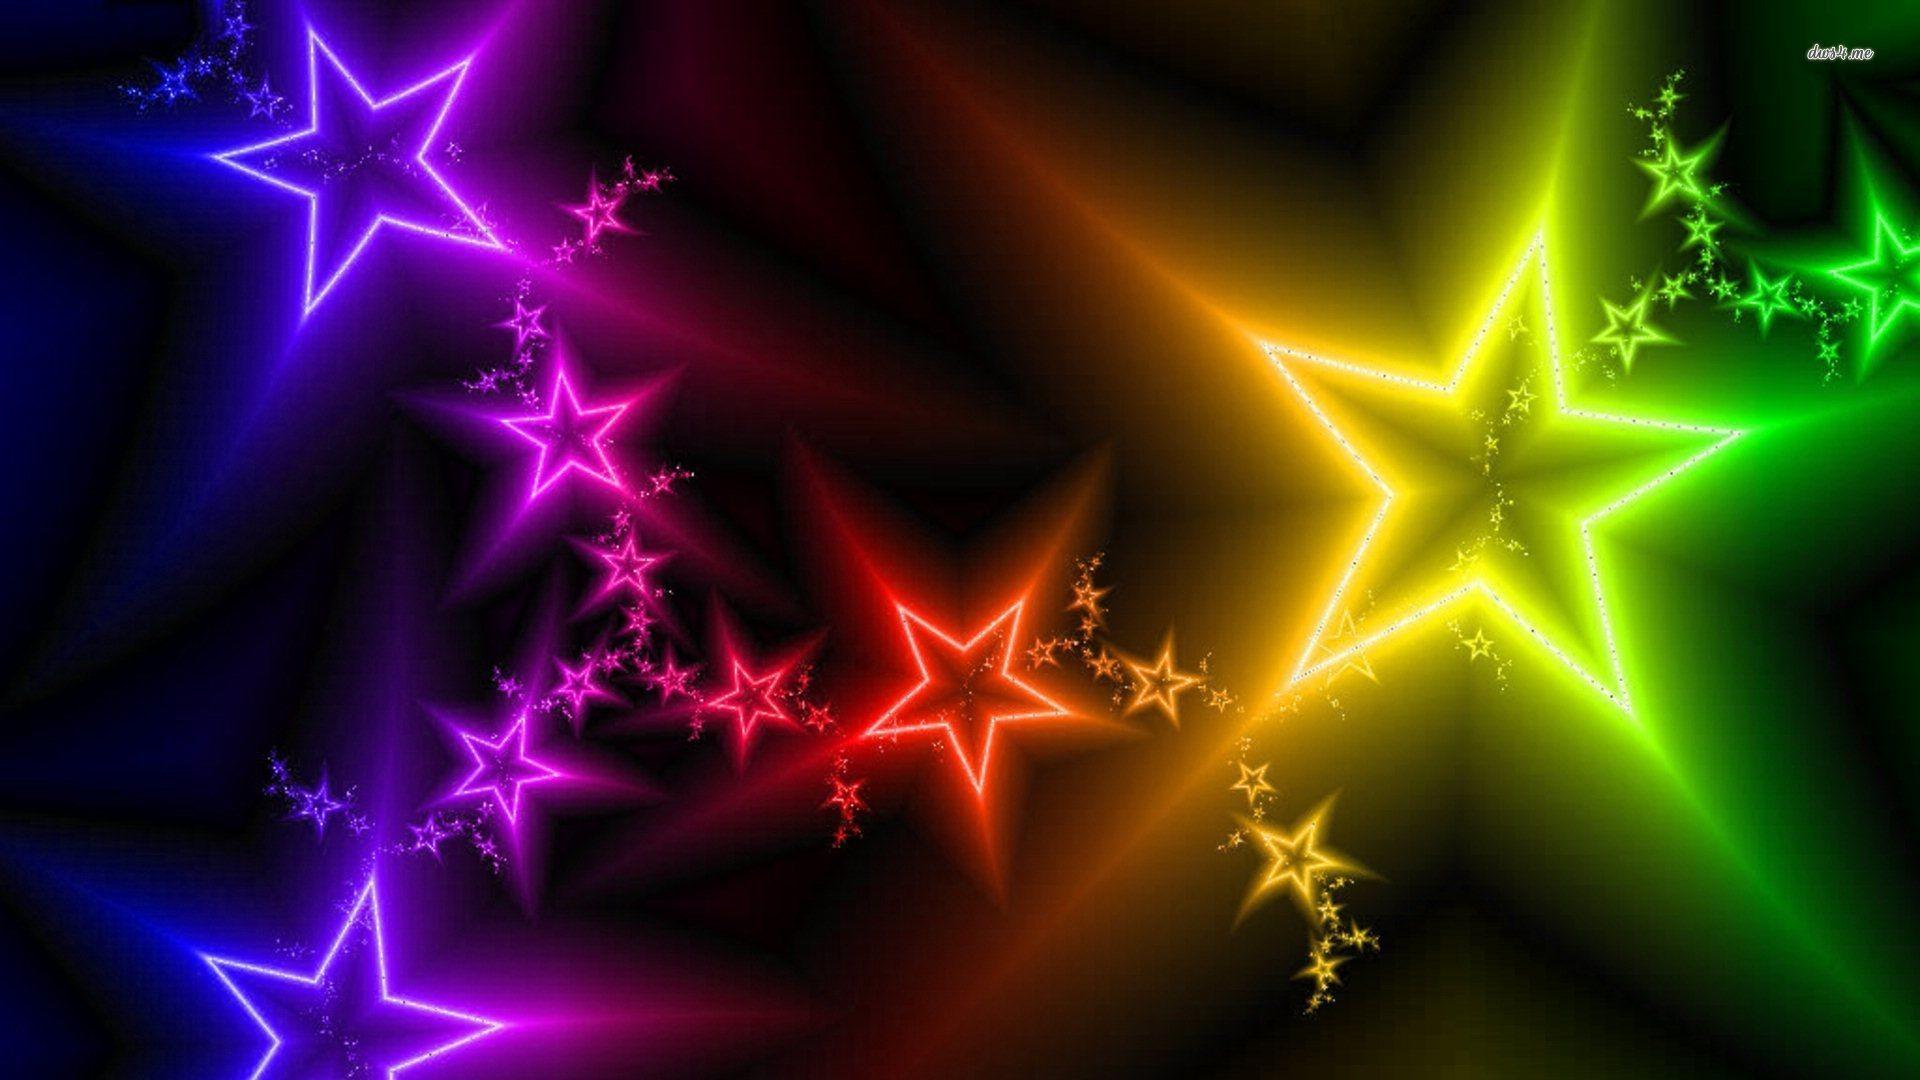 Star Wallpapers Best Star Wallpapers Wide K Ultra HD